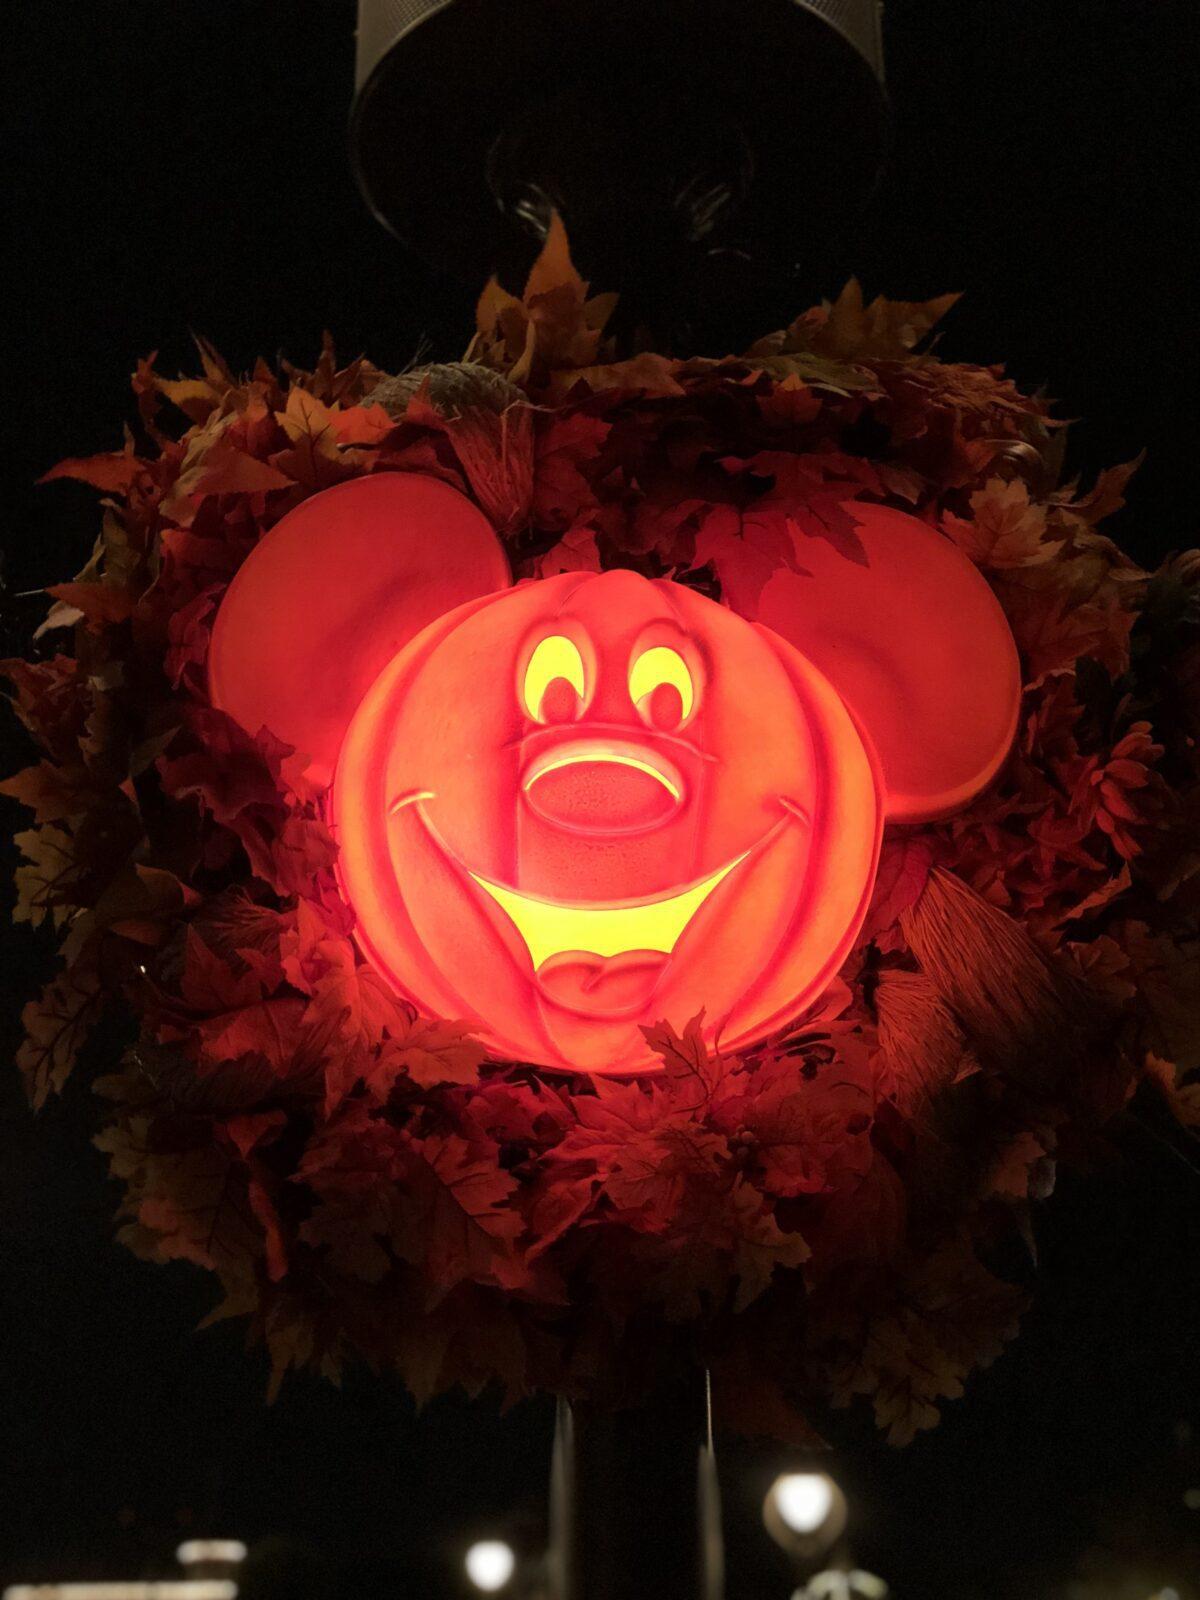 walt disney world, magic kingdom, mickey mouse, walt disney world in one day